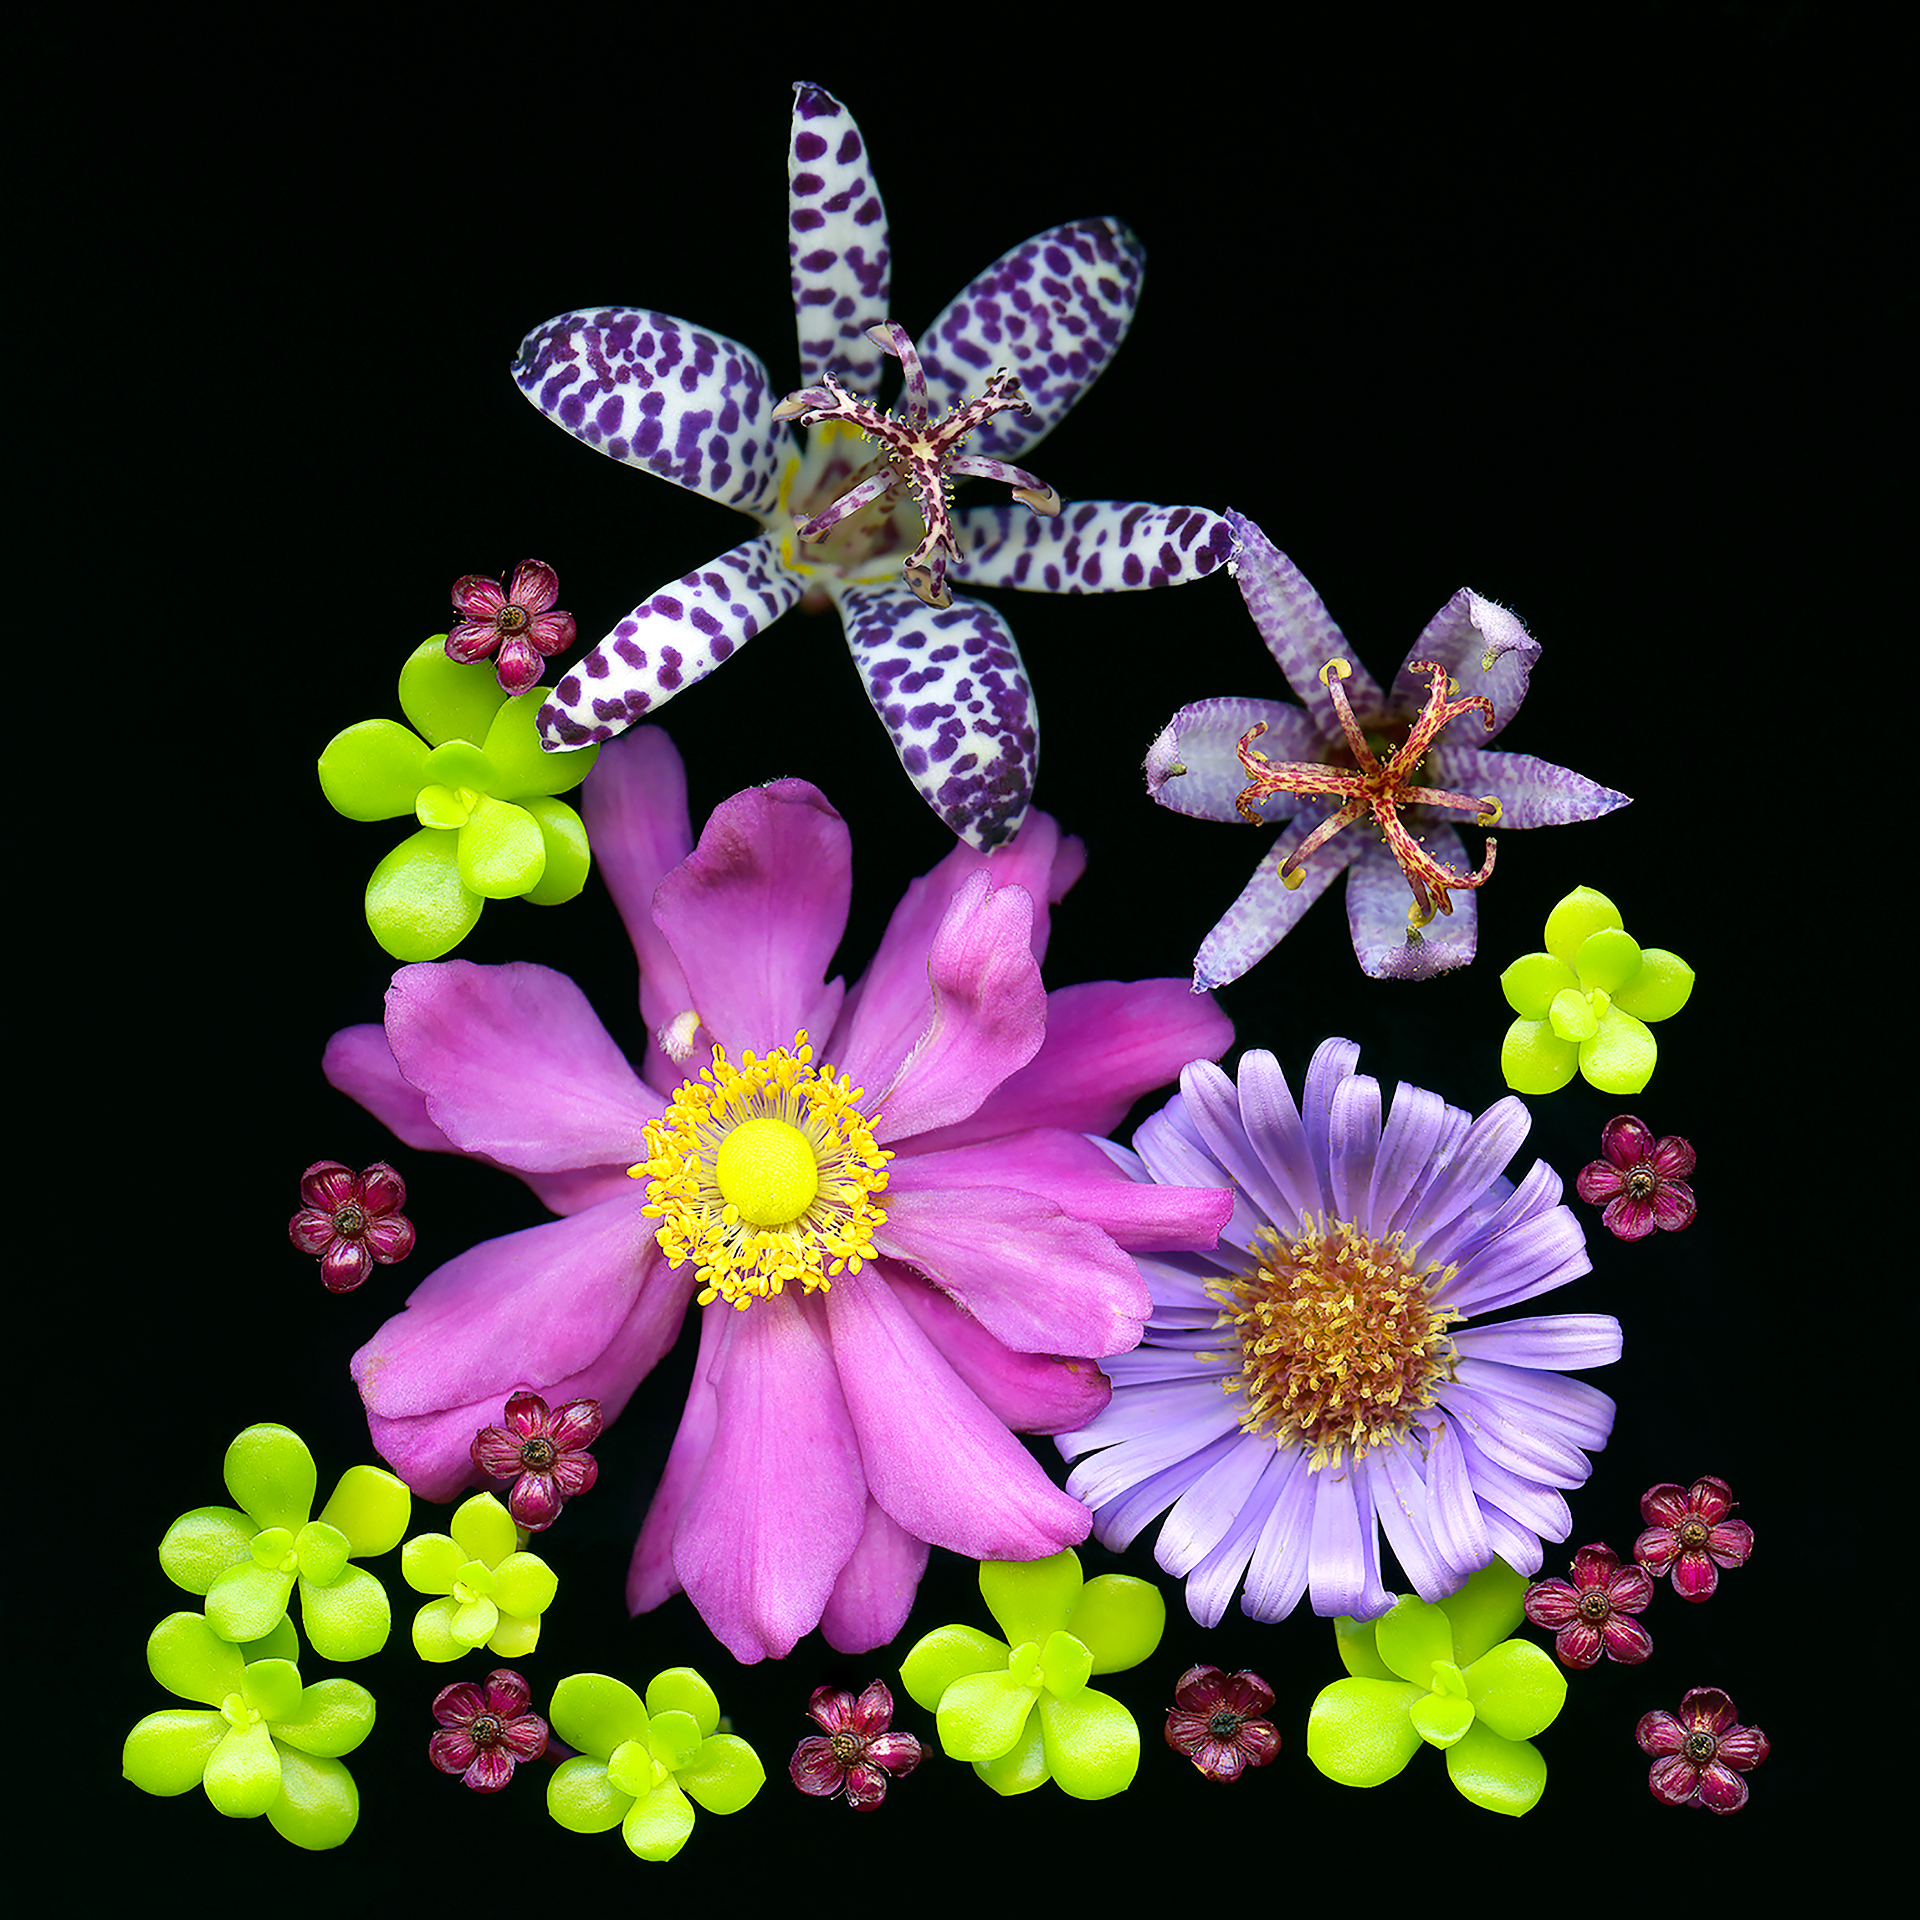 Flower Composition 1